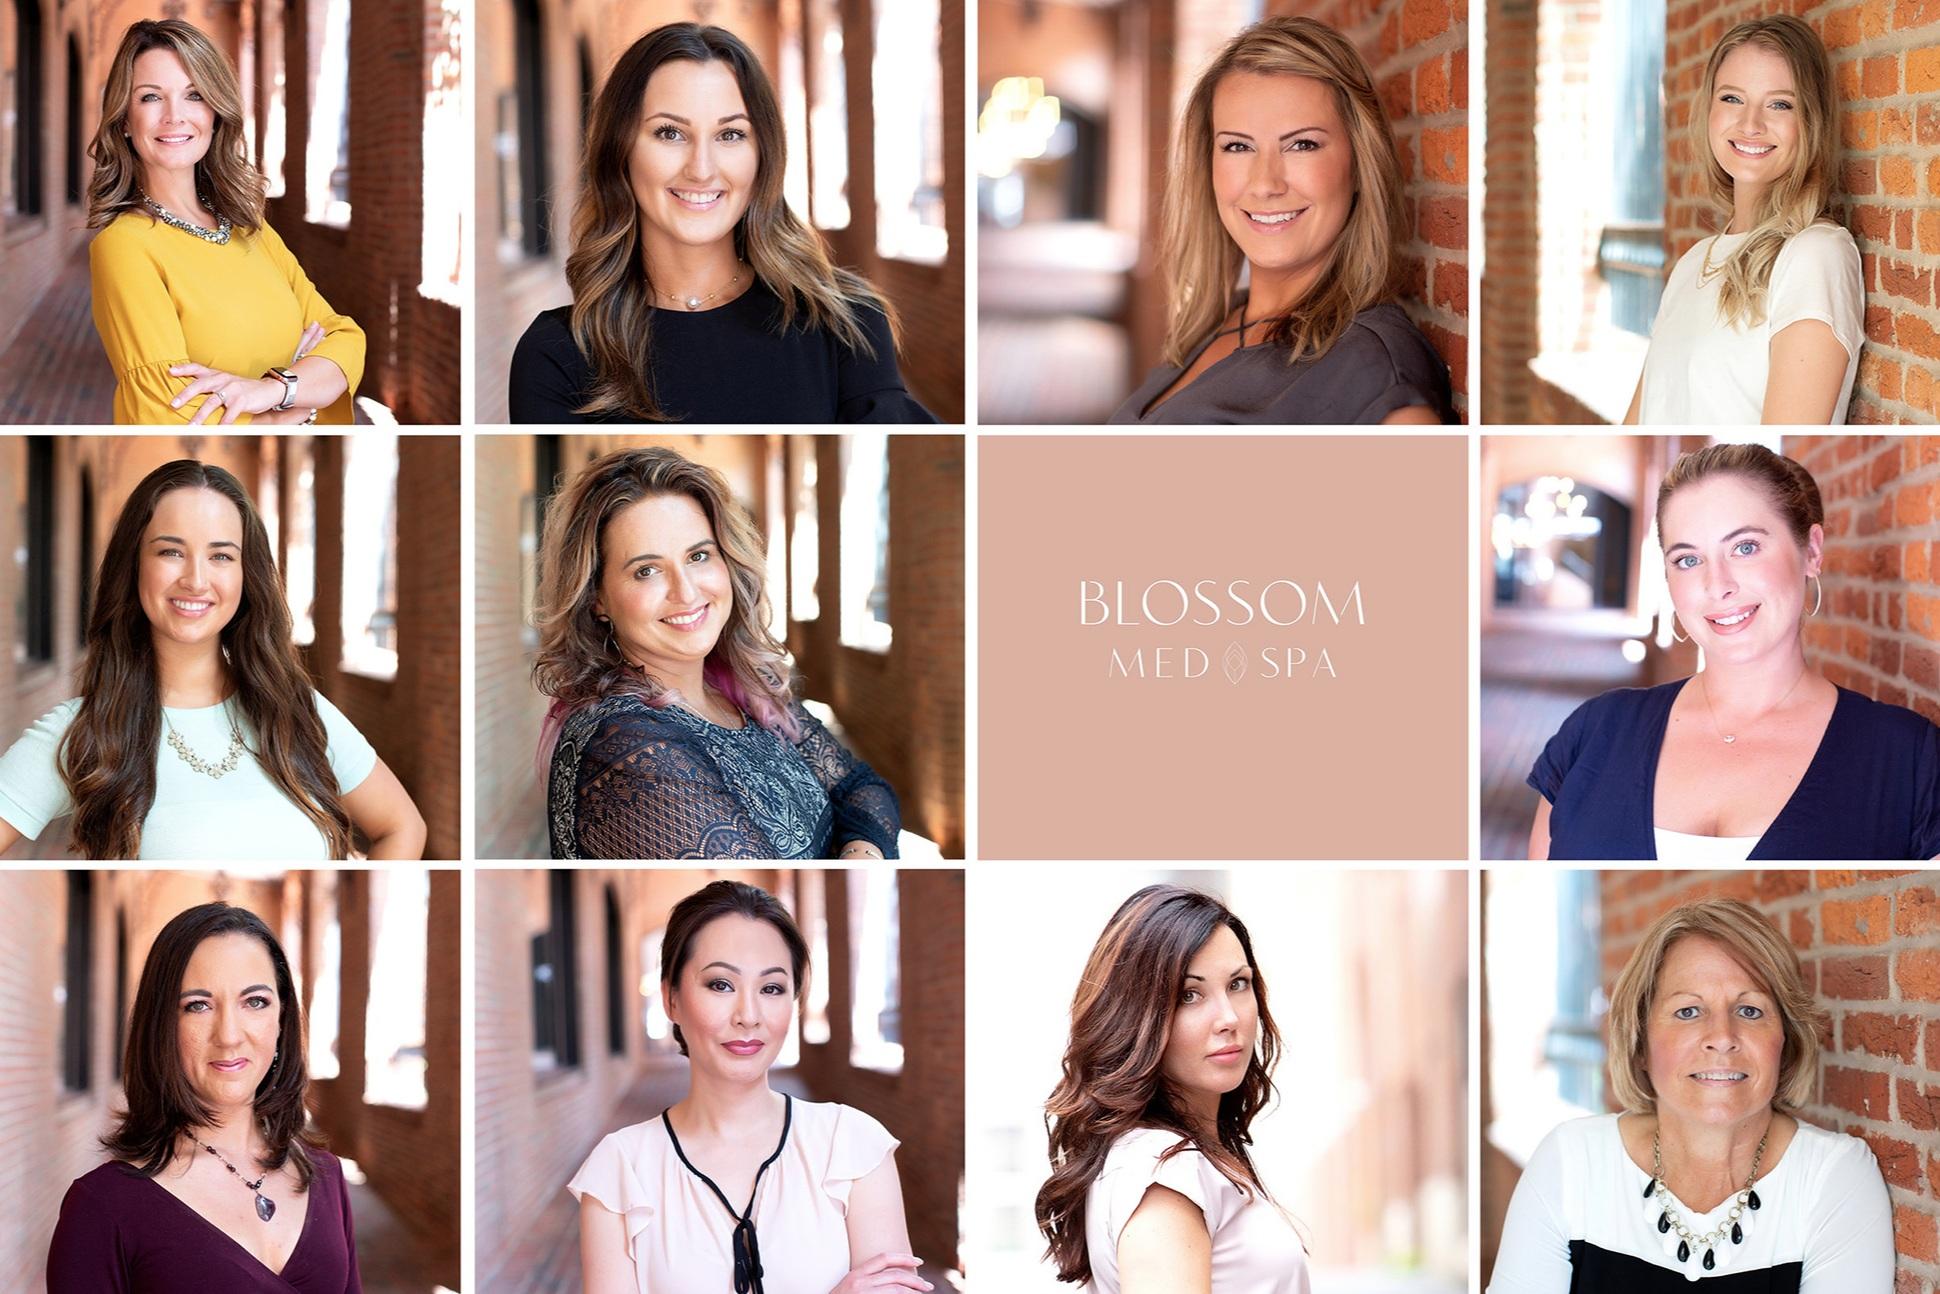 Blossom+Med+Spa+-+Personal+Branding+Photography+-+Lancaster%2C+PA+-+Amanda+Kraft+Photography